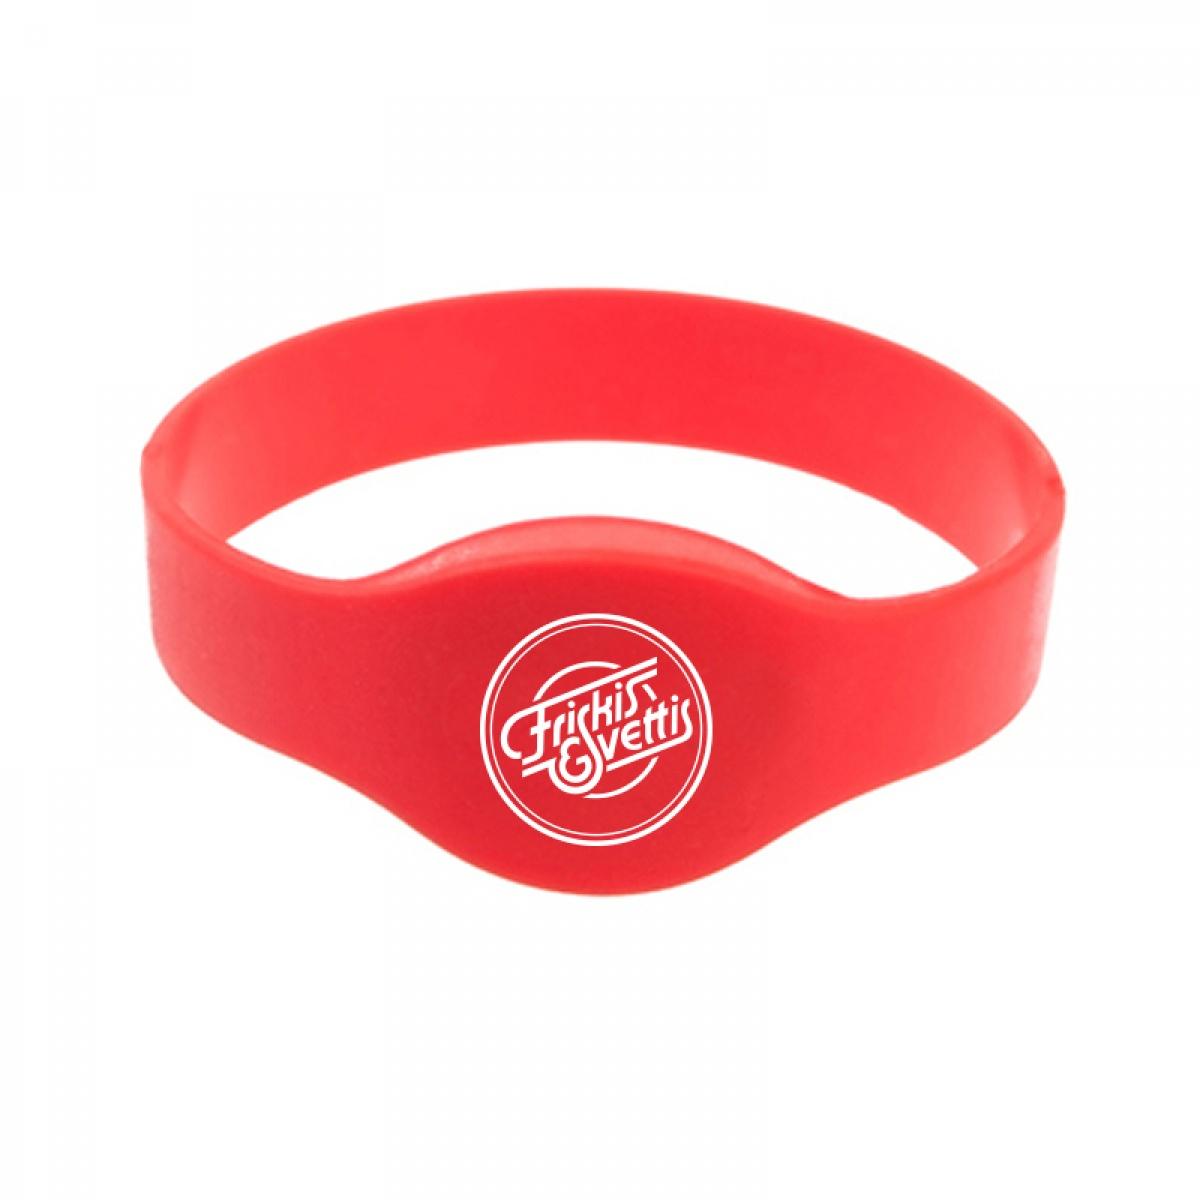 RFID-armband - M/L 65mm